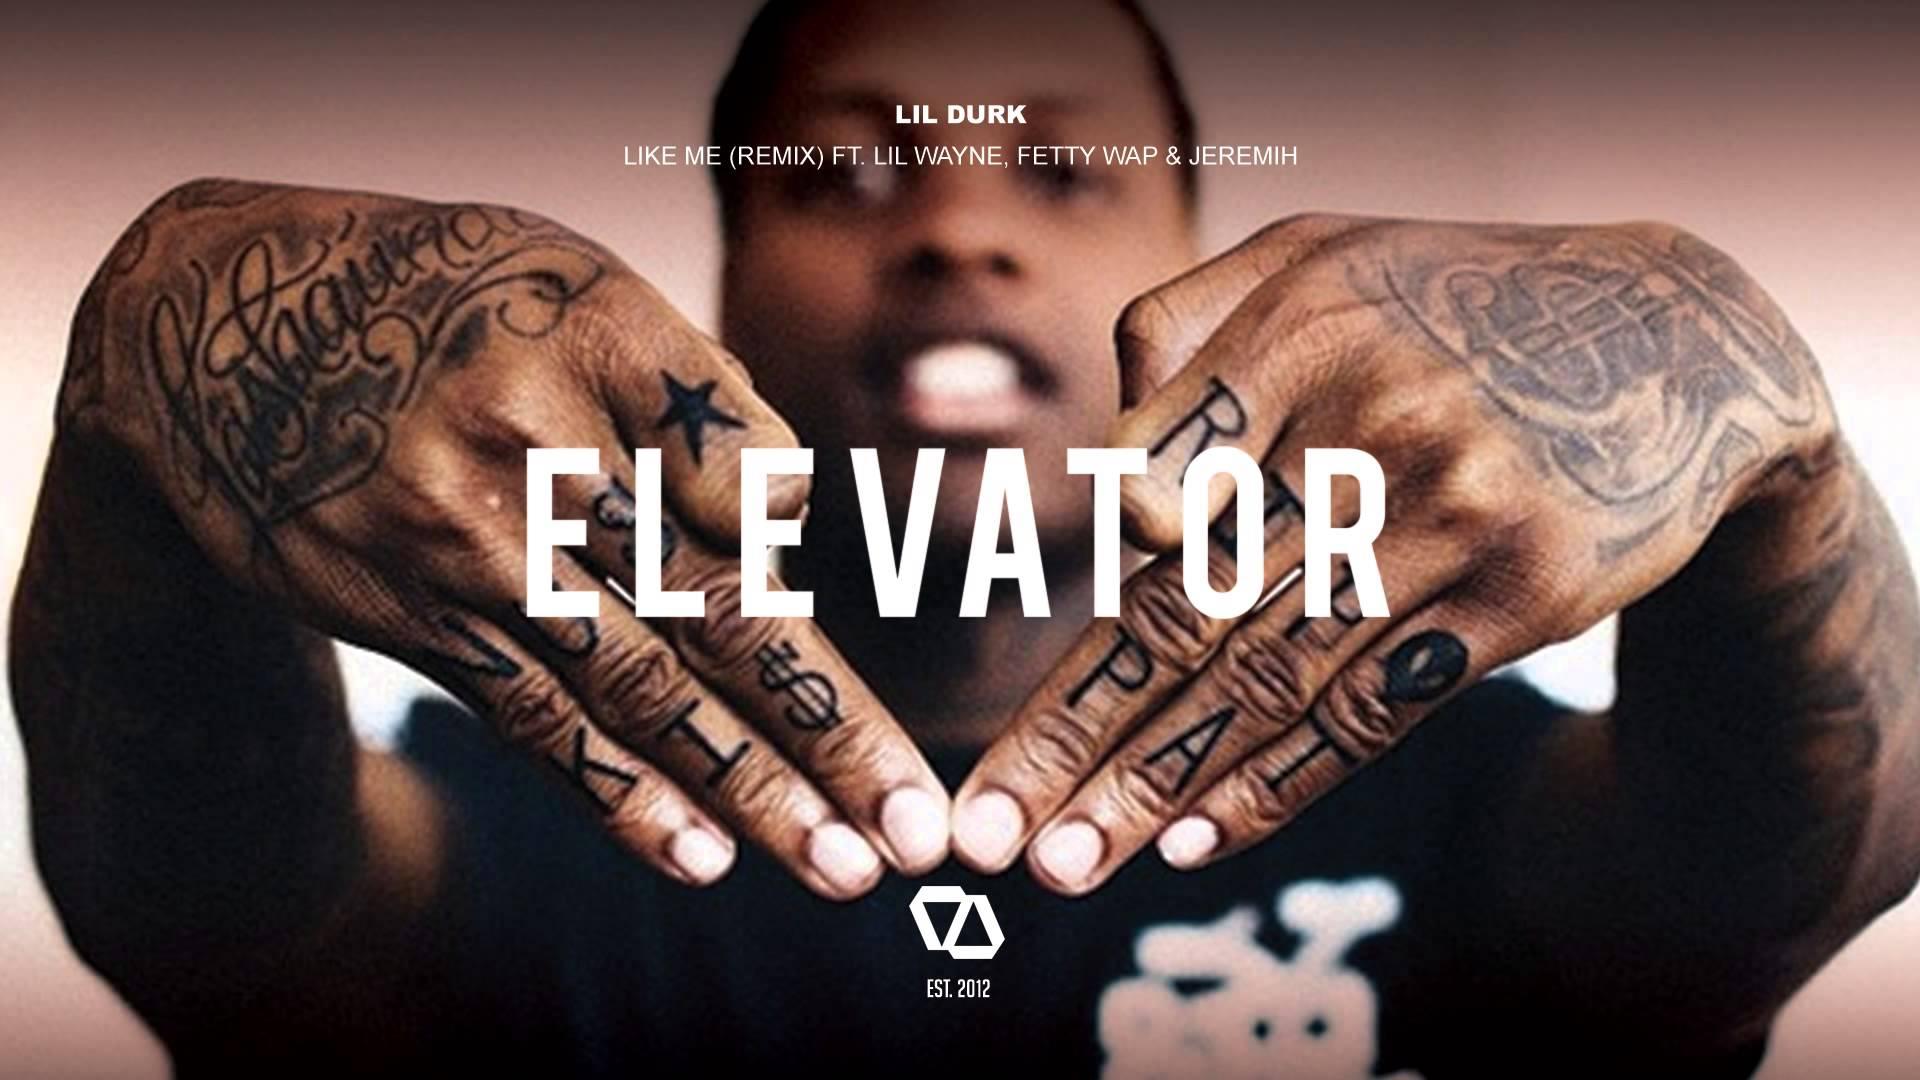 Lil Durk - Like Me (Remix) Ft. Lil Wayne, Fetty Wap &